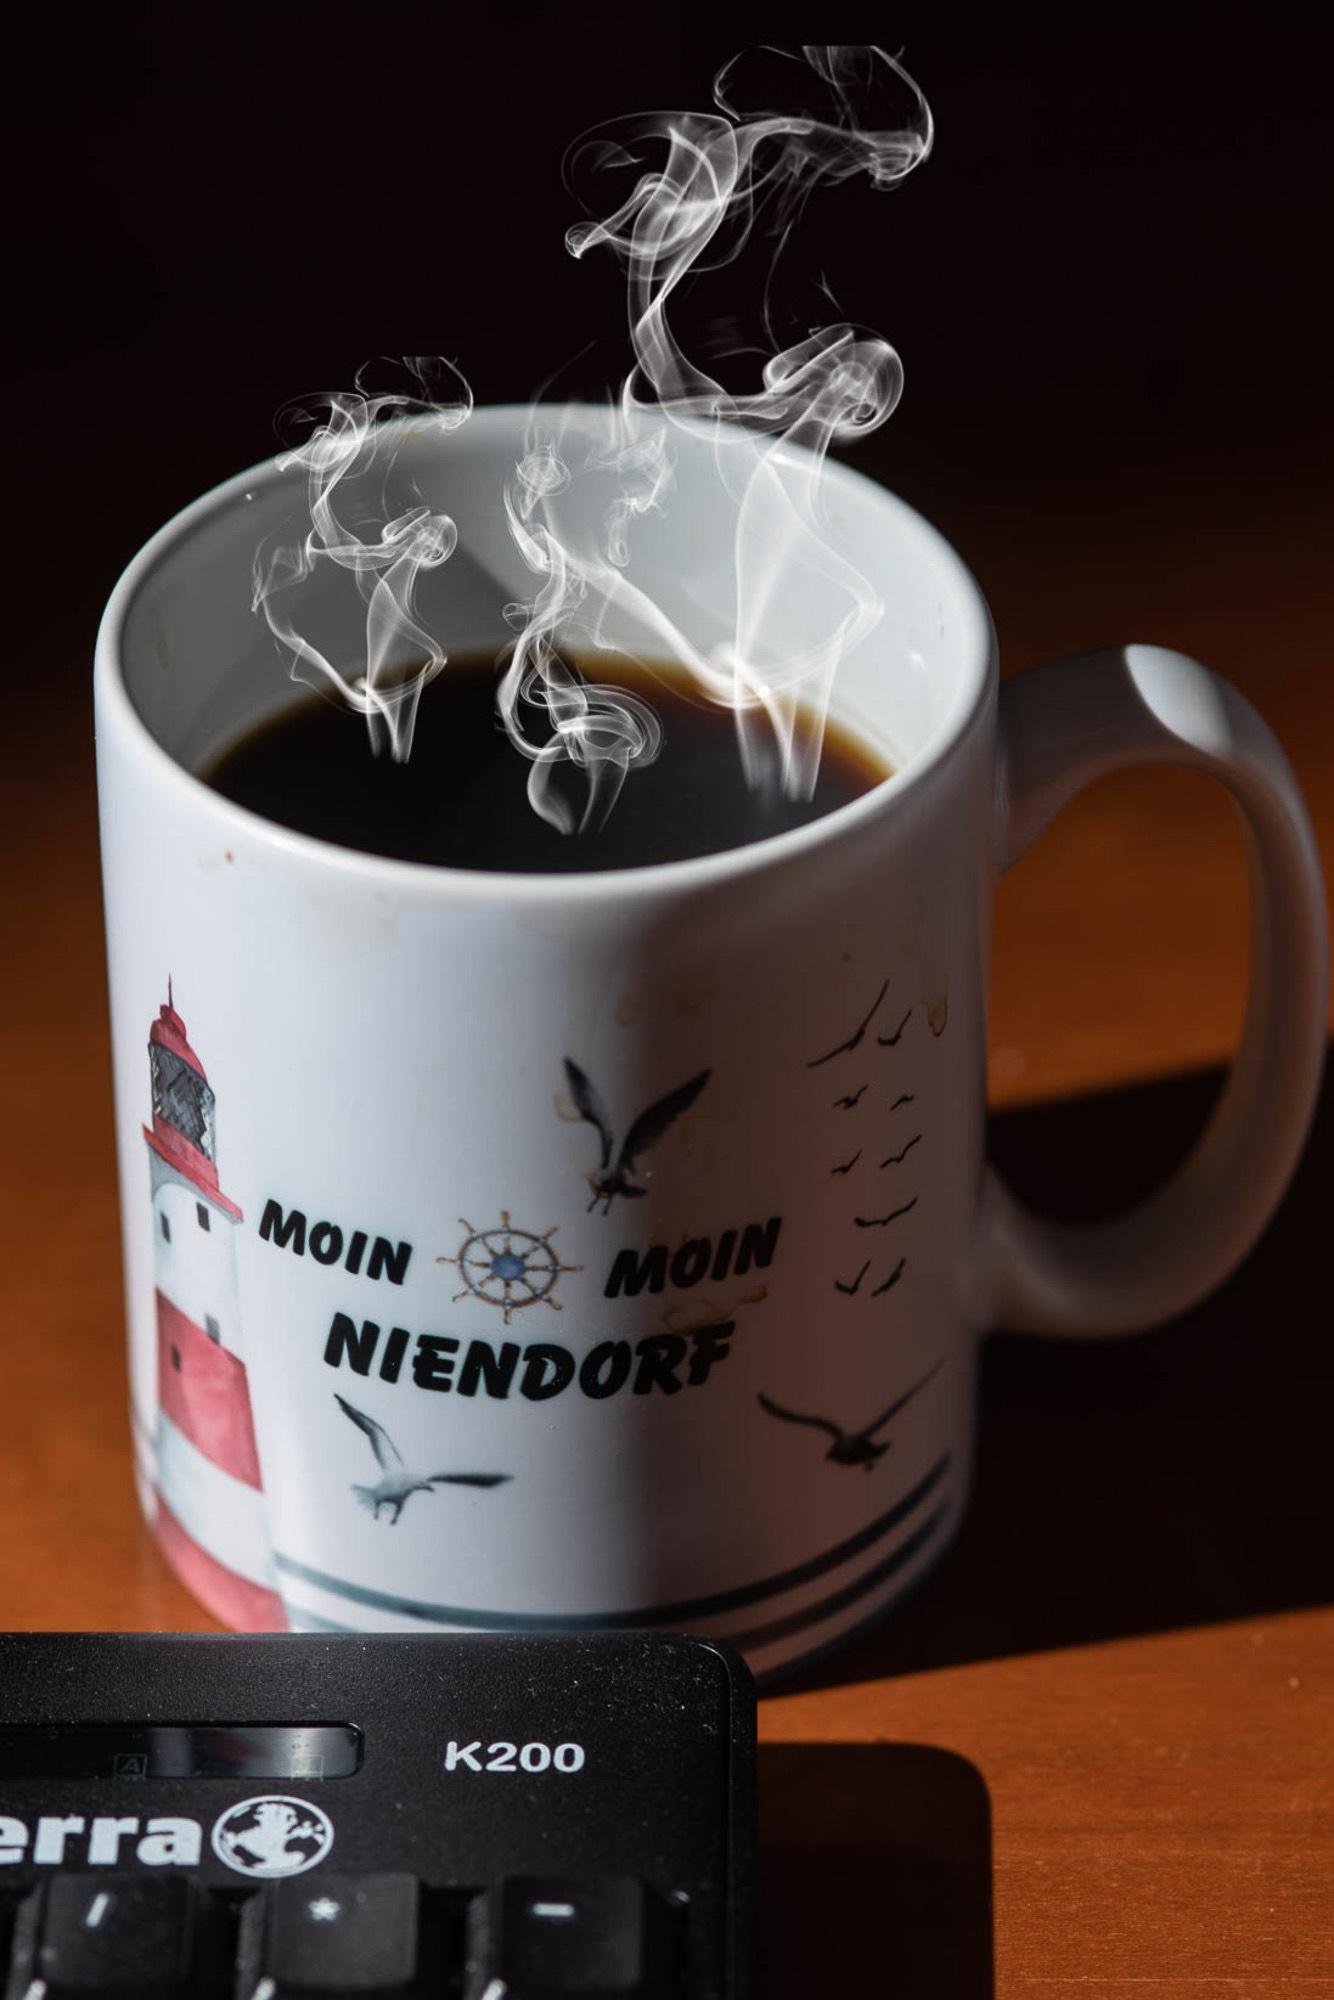 Kaffee-ist-fertig